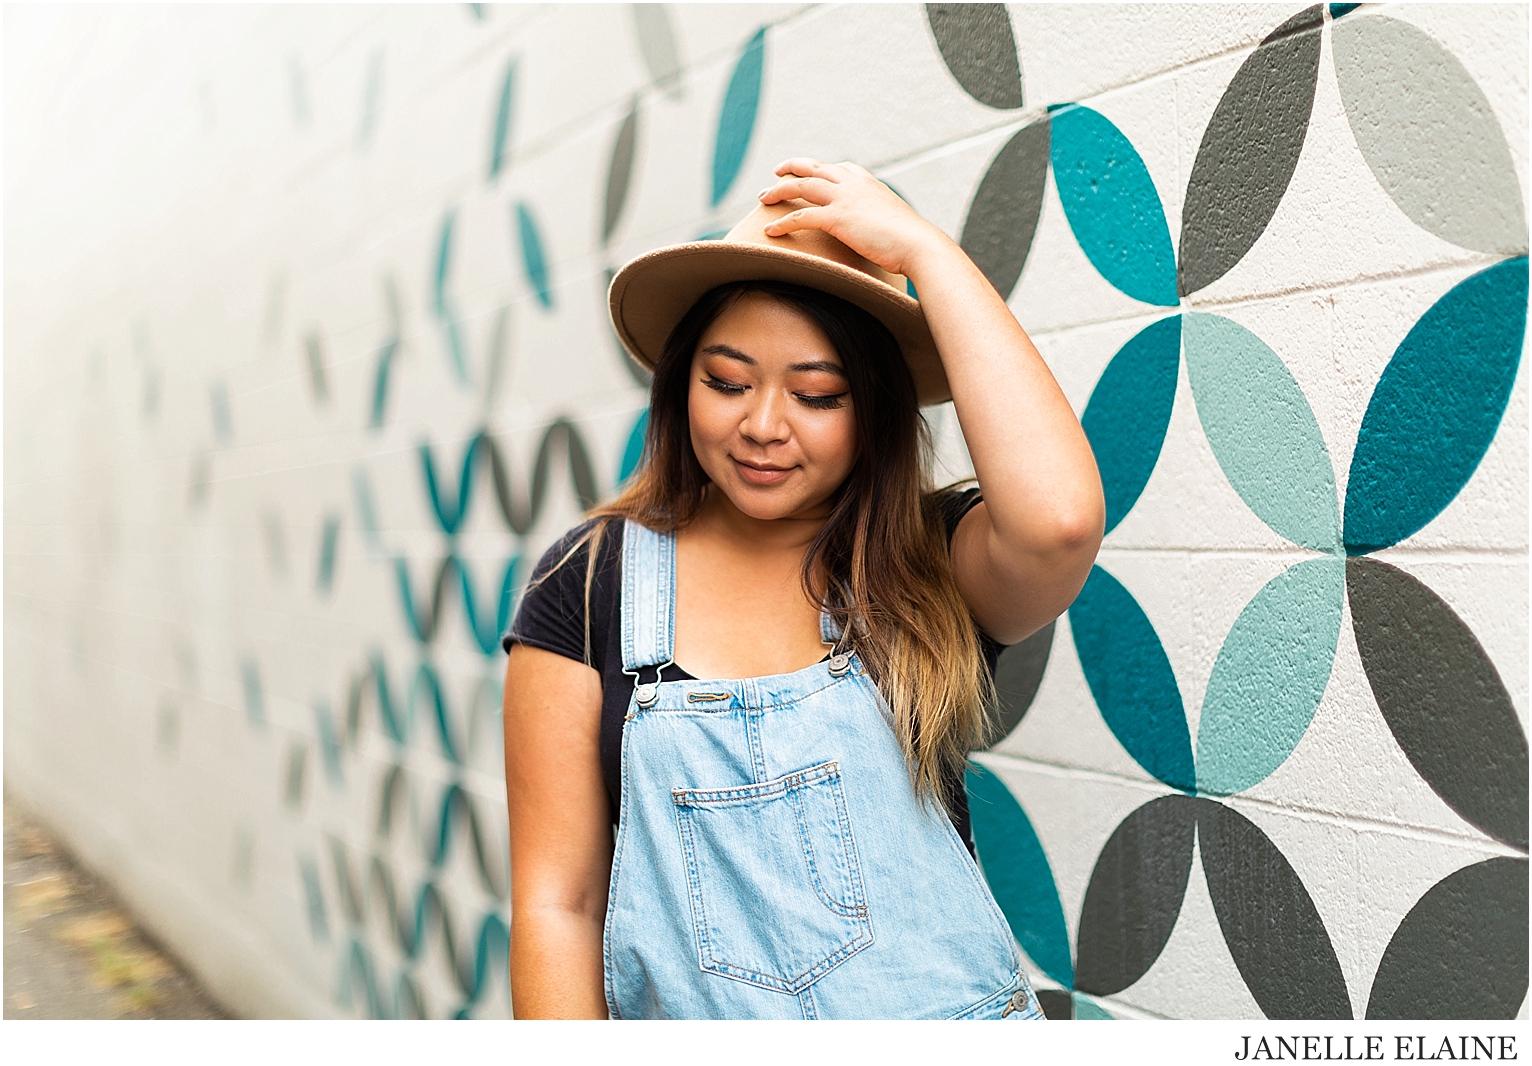 Aiko-Seattle WA-lifestyle photoshoot-Renton-Janelle Elaine Photography-19.jpg